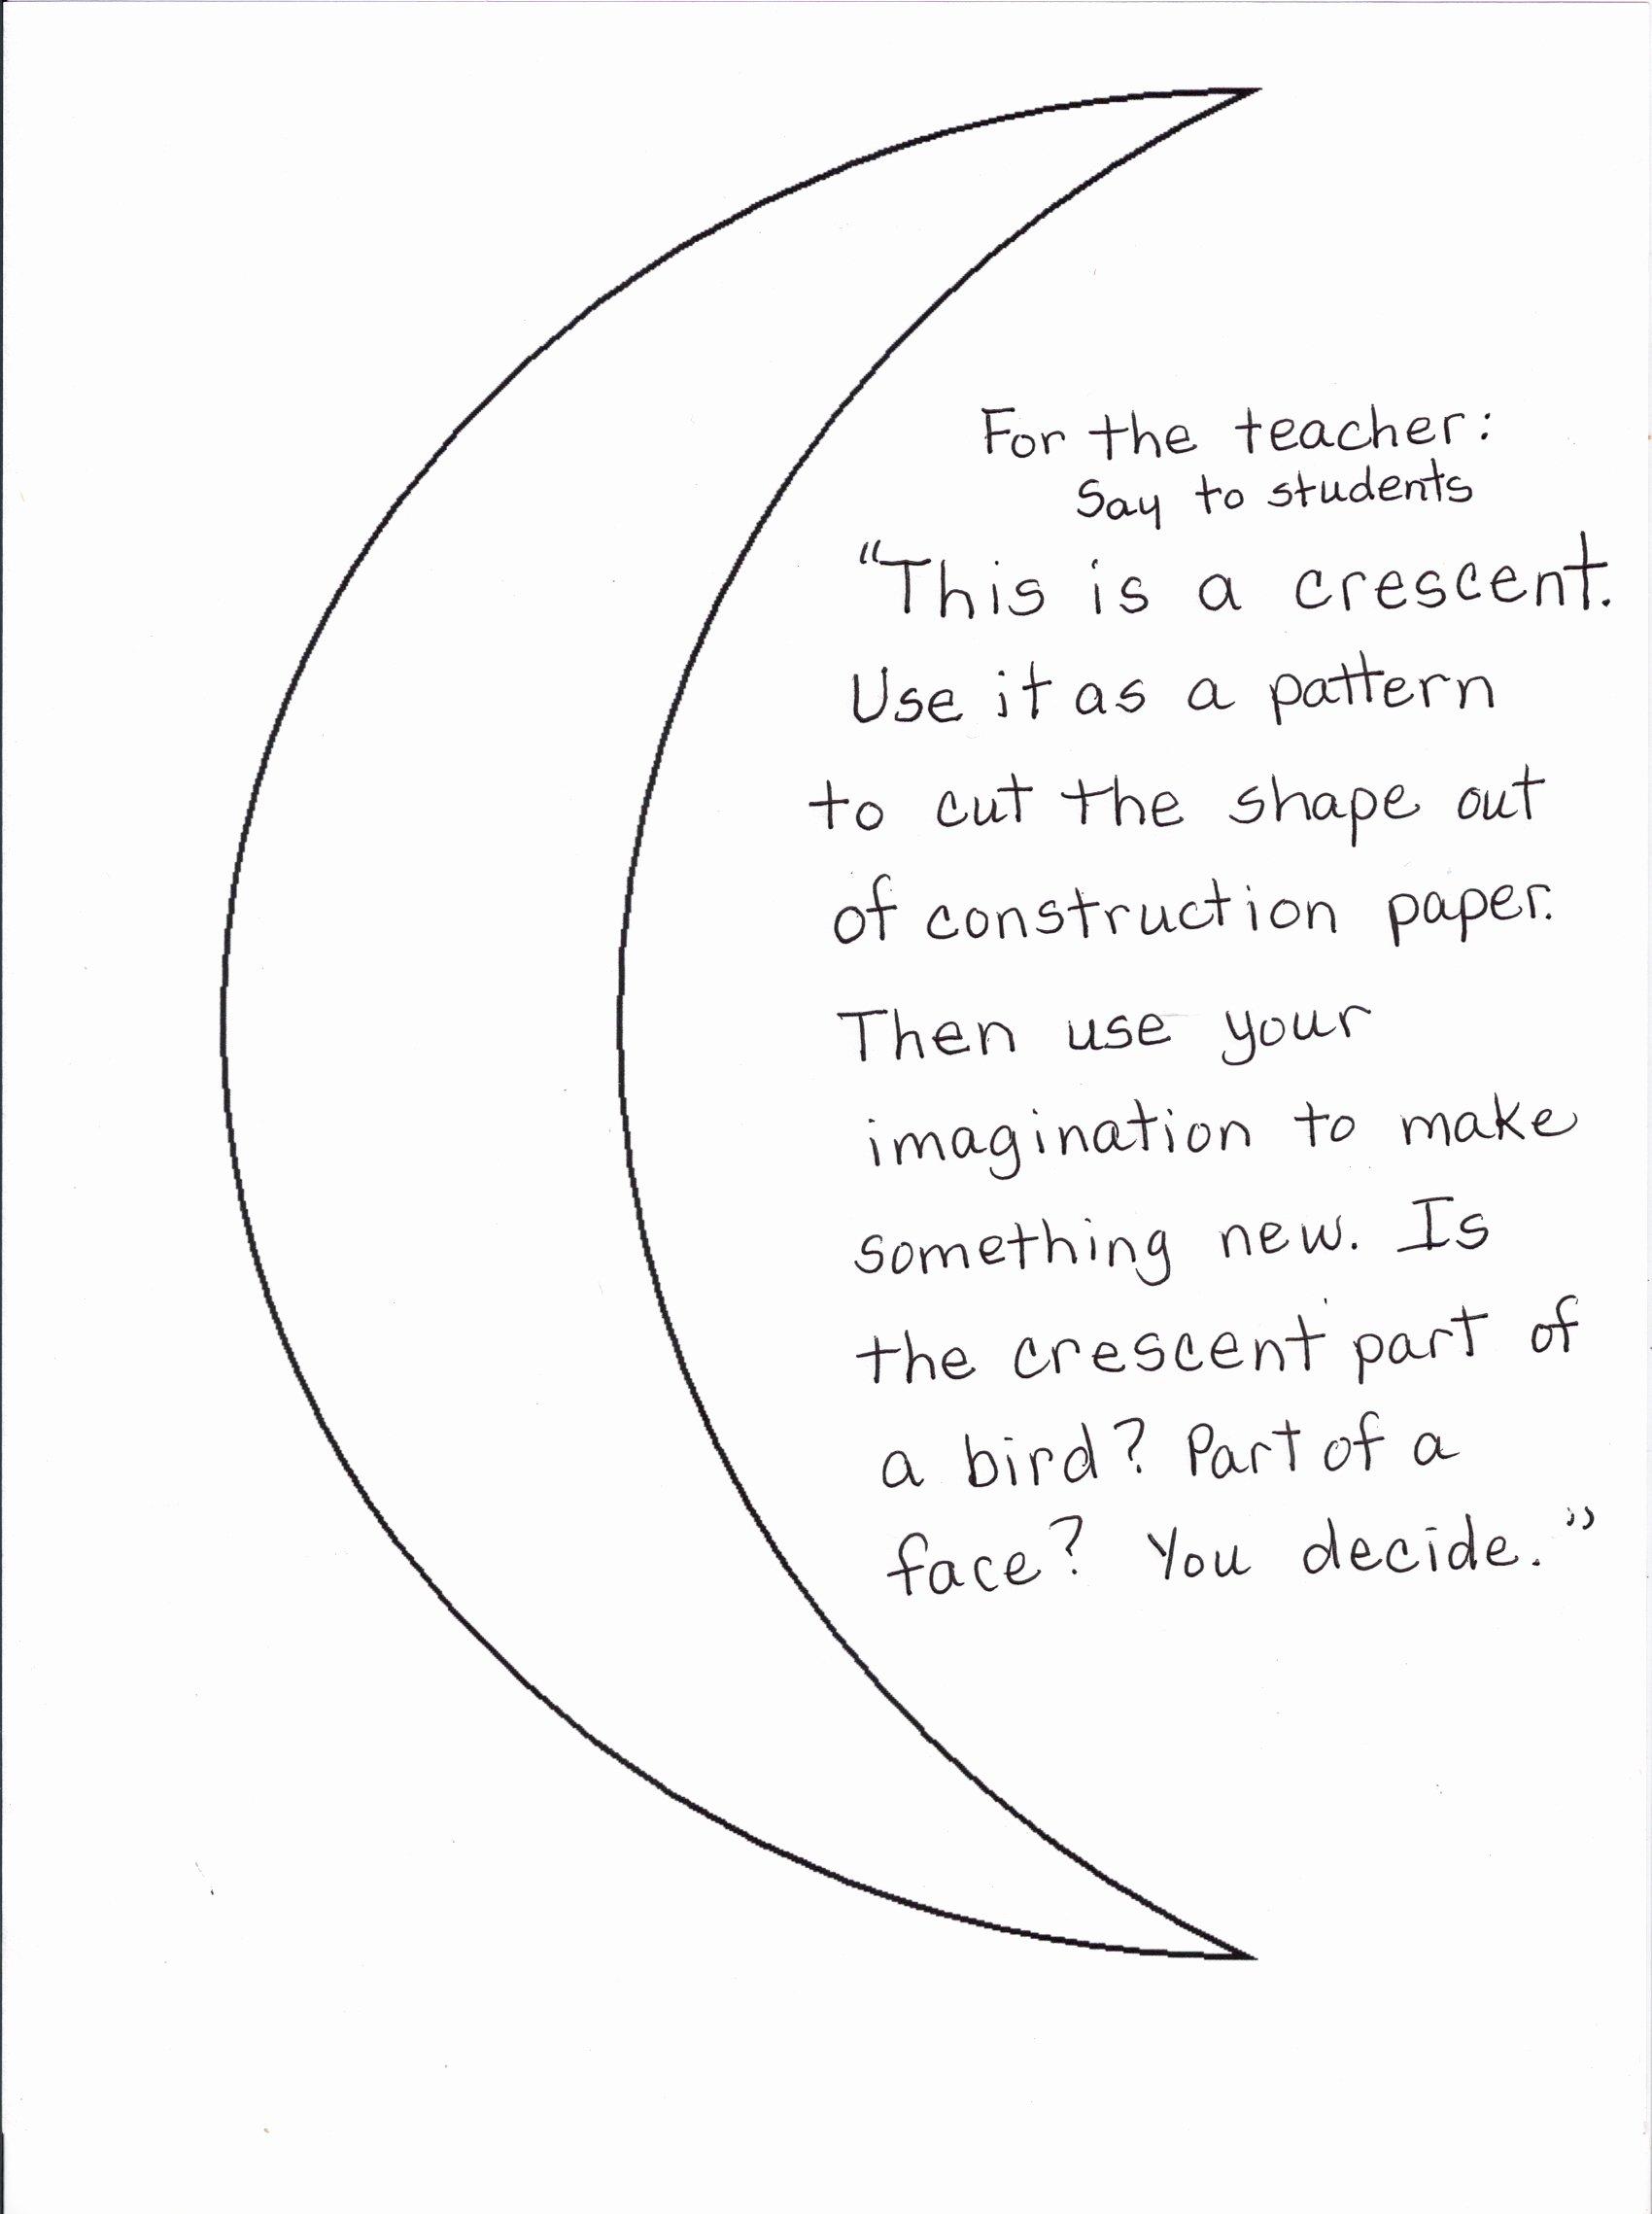 Crescent Shape Worksheets for Preschoolers Unique Crescent Shape Worksheets Printable and Activities Preschool